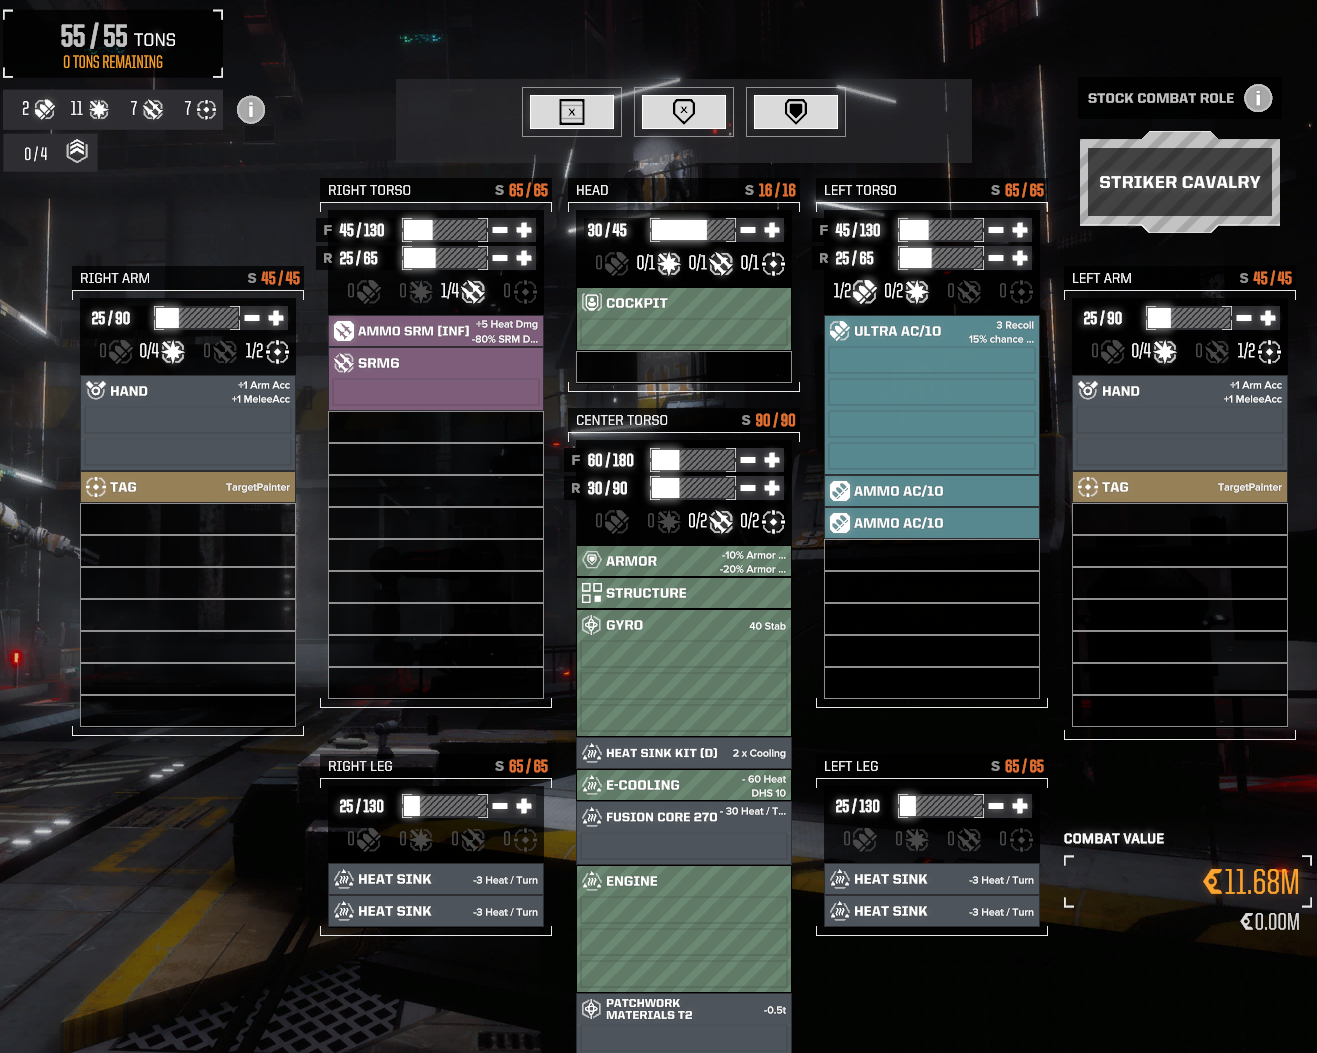 Shadowhawk-SHD-2I.png